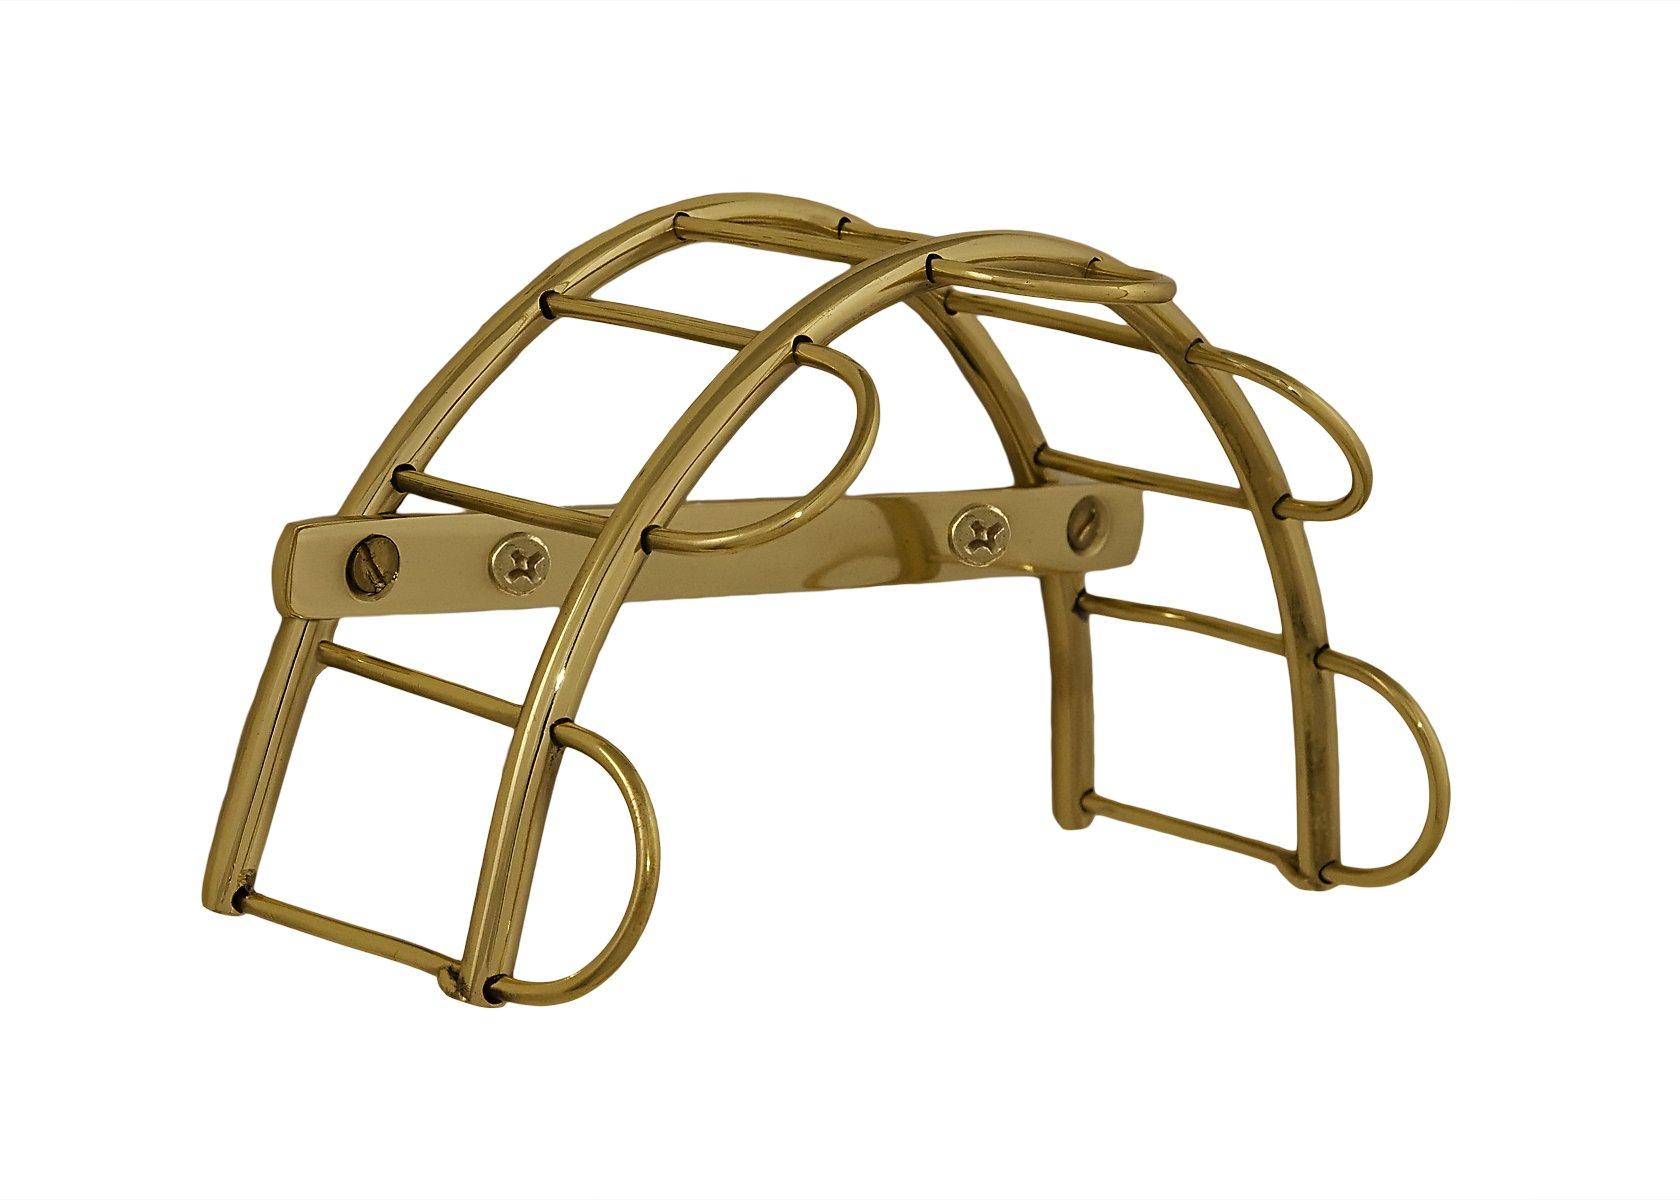 Tack Room Studio Brass Bridle Rack (Brass) by Tack Room Studio